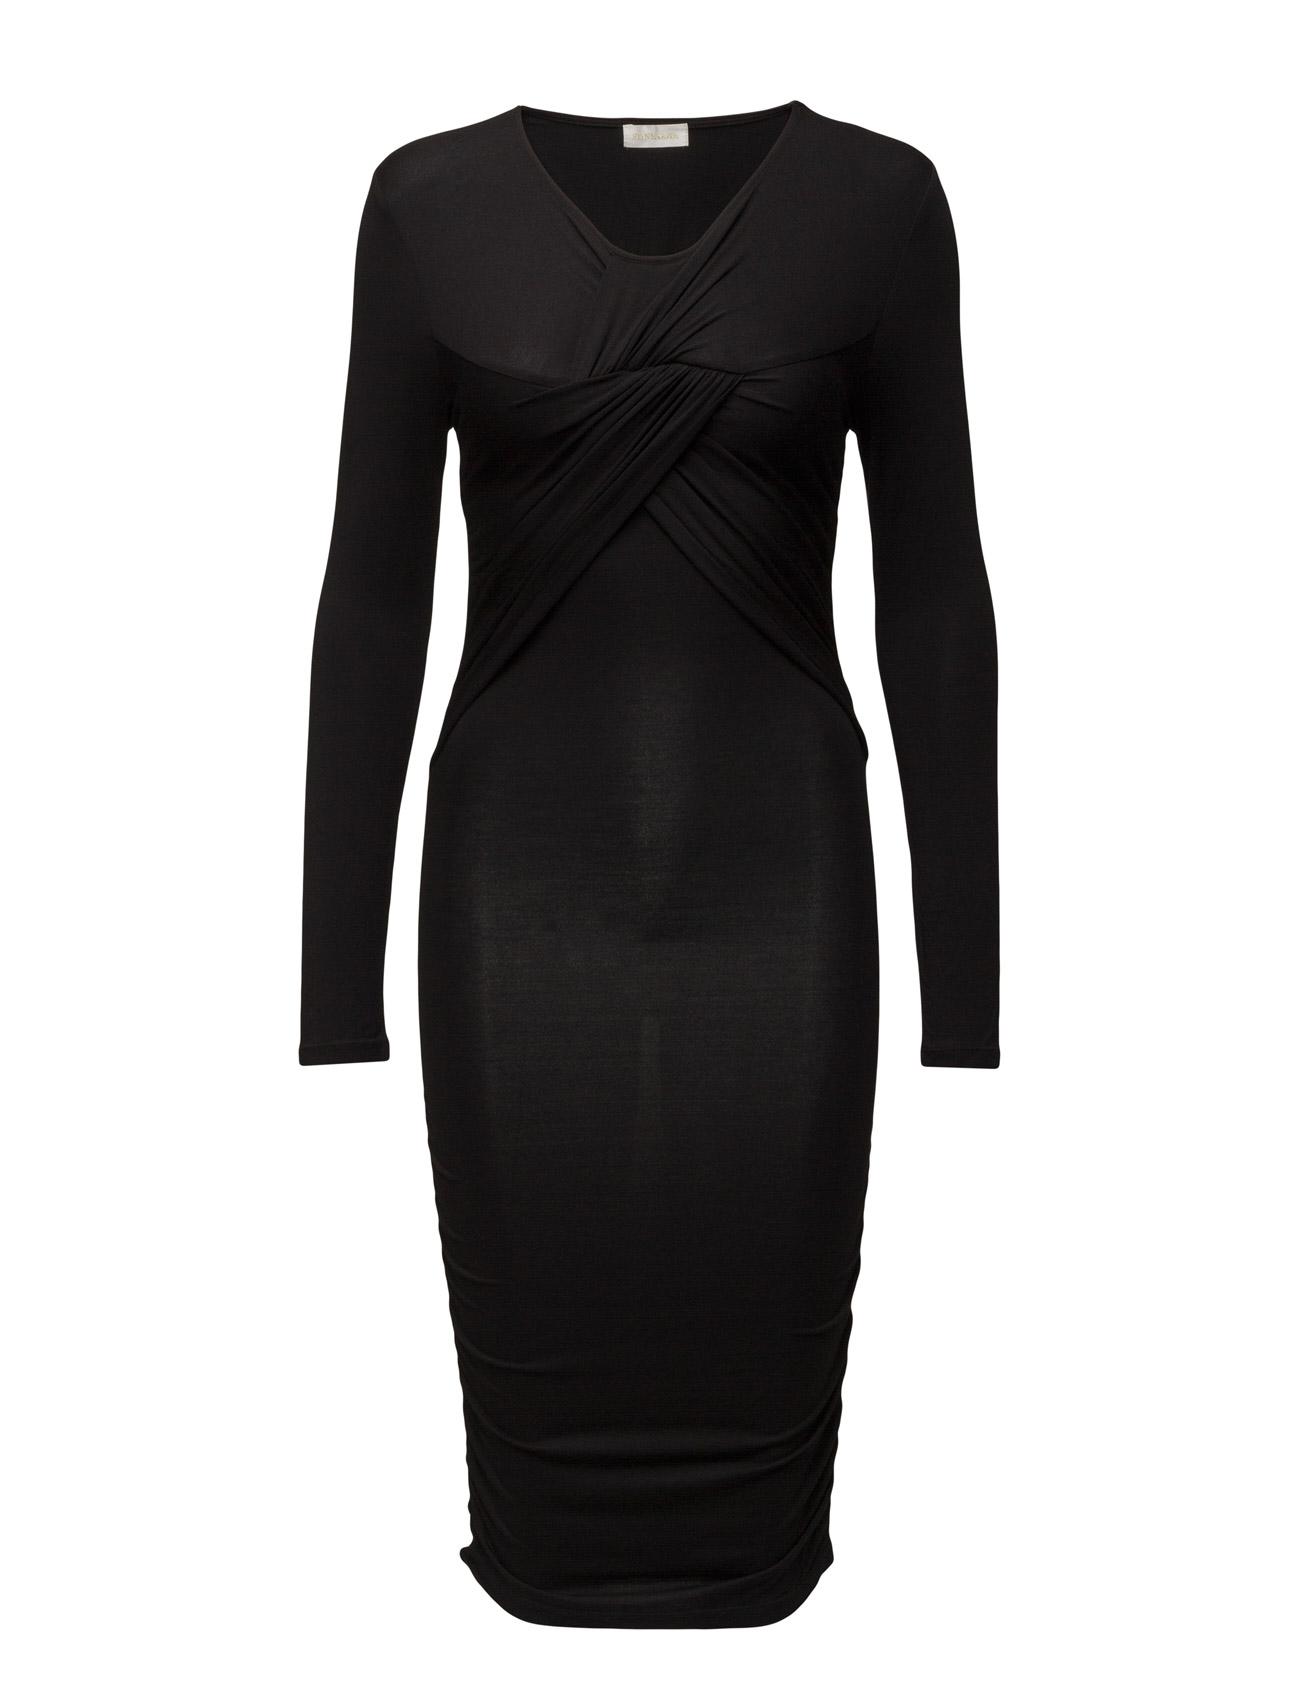 Fantastique Dress